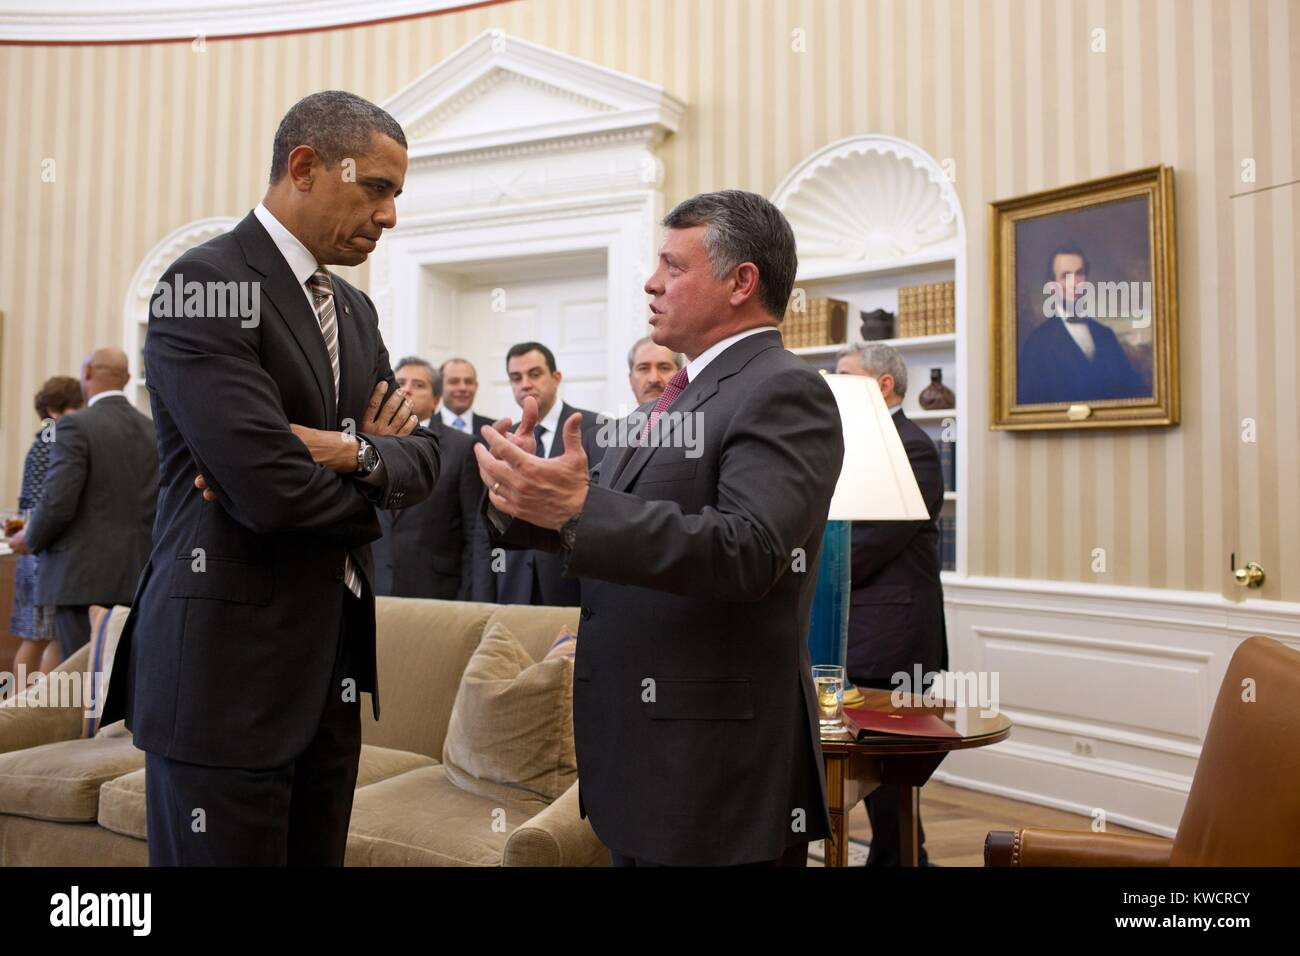 Präsident Barack Obama spricht mit König Abdullah II von Jordanien im Oval Office. 17. Januar 2012 (BSLOC Stockbild